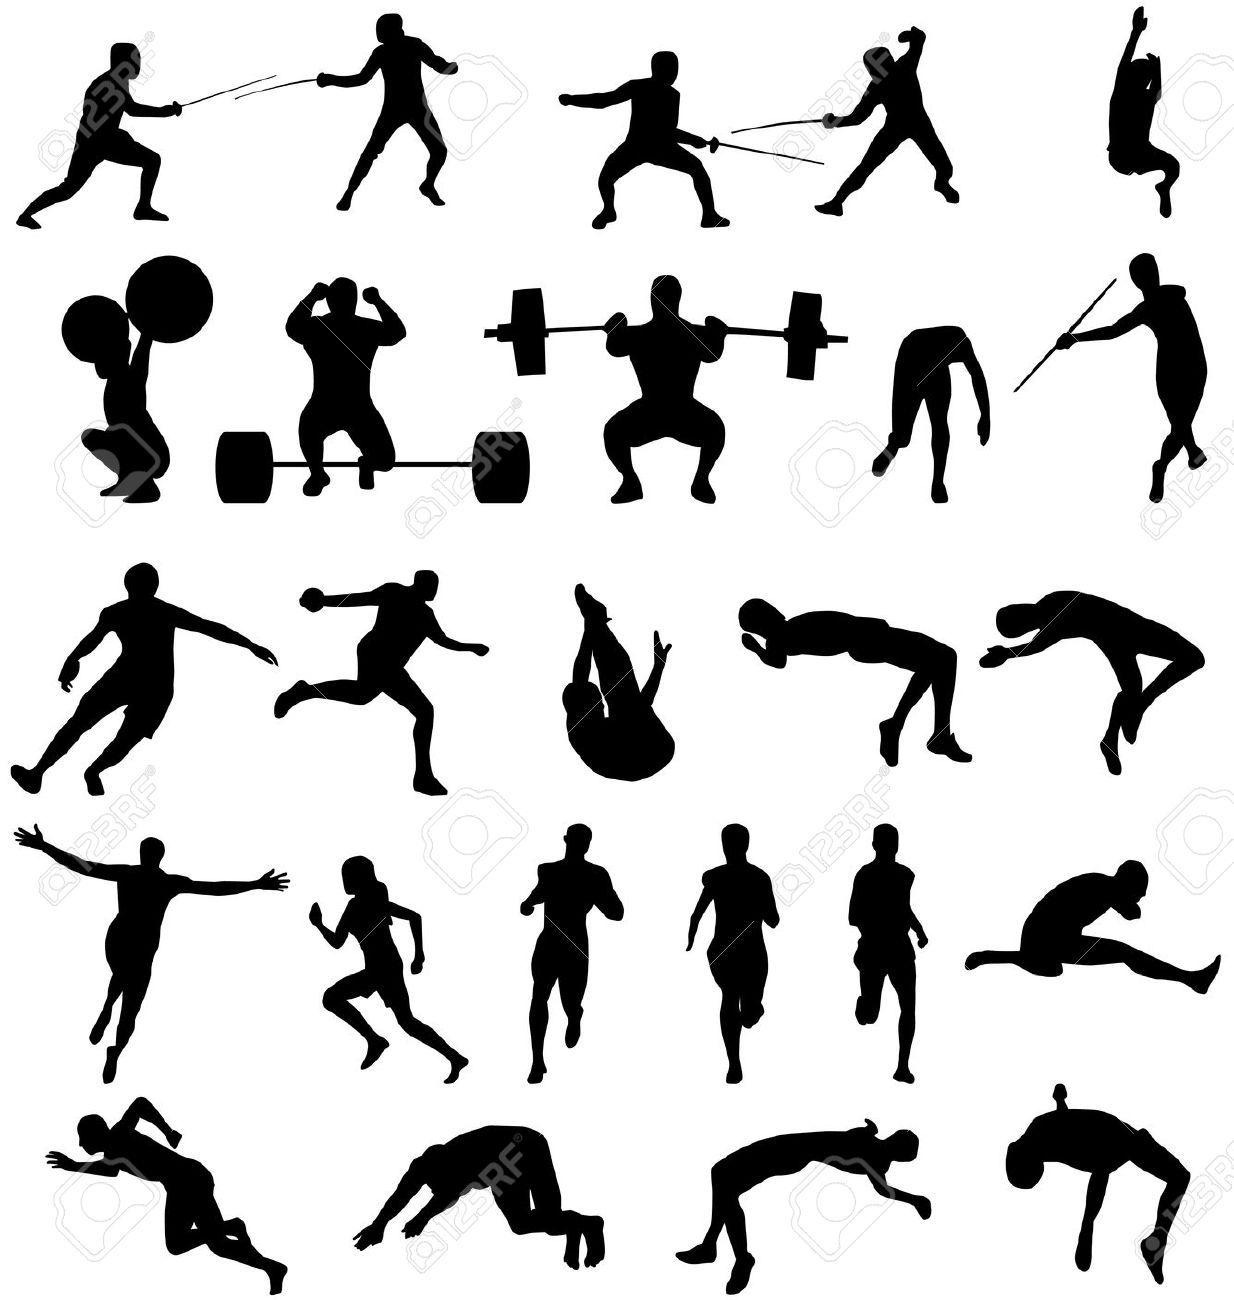 Athlete Silhouette